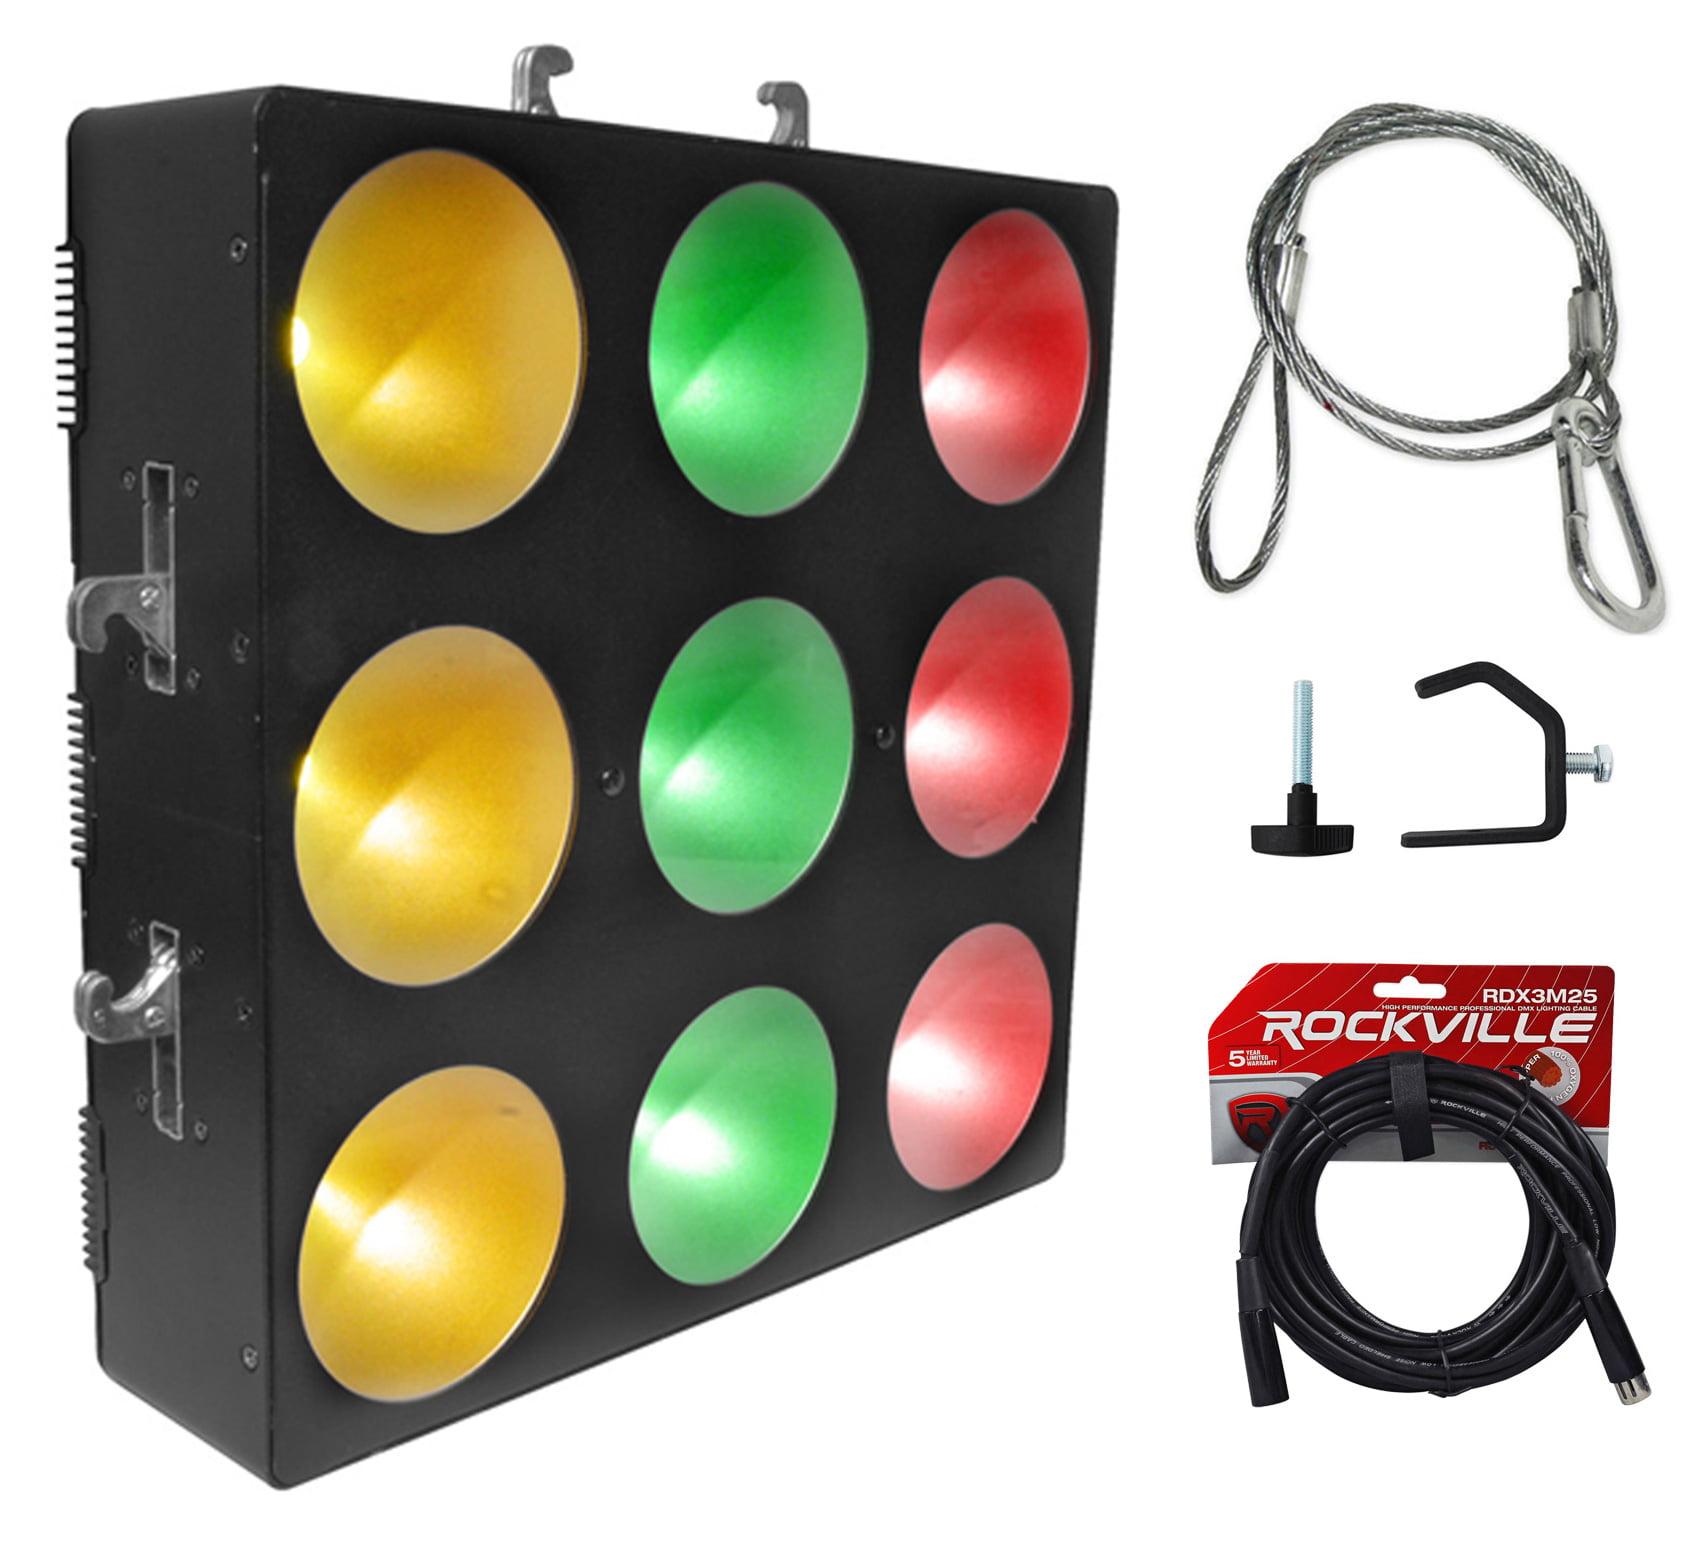 Chauvet DJ CORE 3x3 COB LED Pixel Mapping Wash Light+Clamp+Harness+DMX Cable